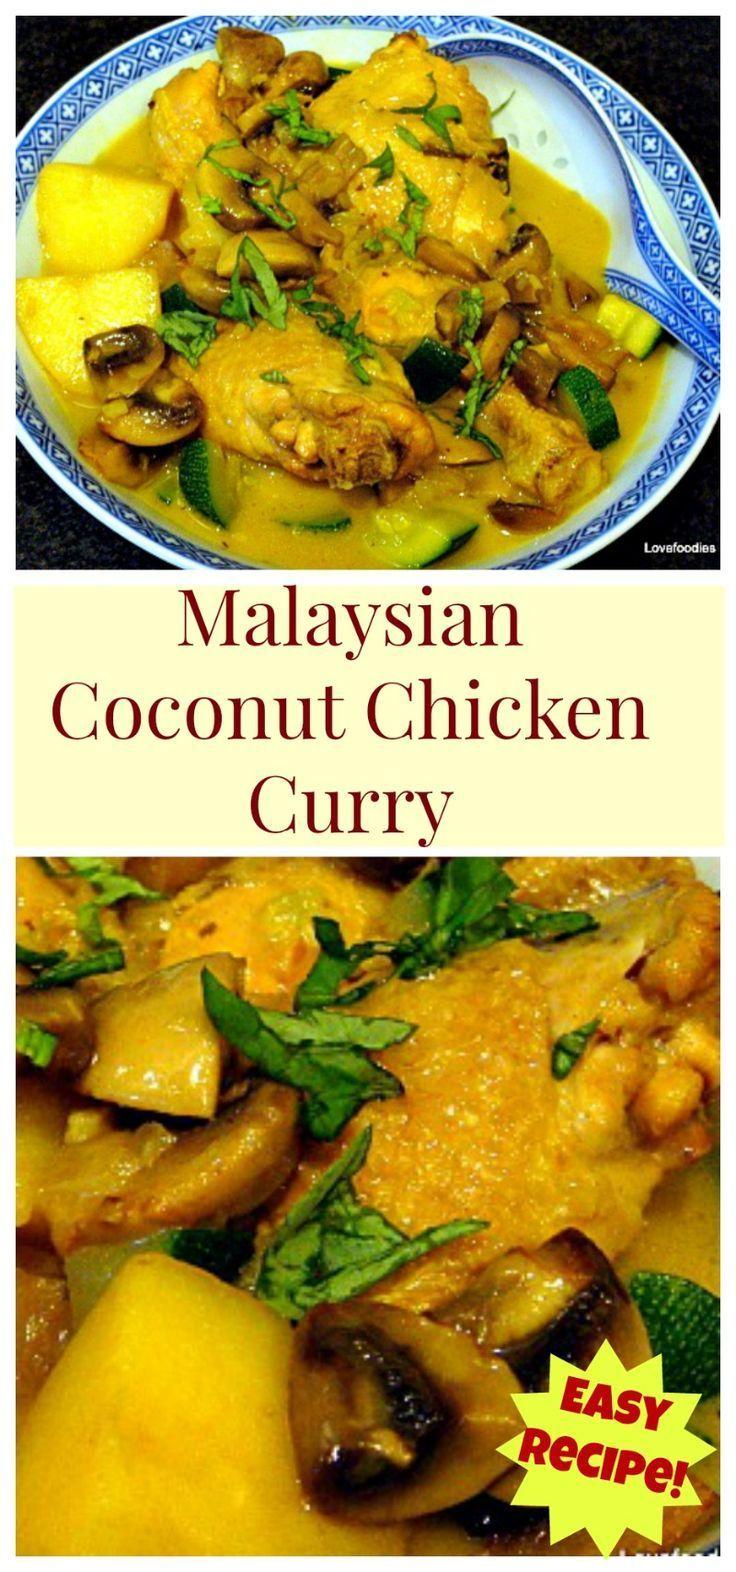 Cheats malaysian coconut chicken potato curry easy no fuss cheats malaysian coconut chicken potato curry easy no fuss dinner and goes great with forumfinder Choice Image